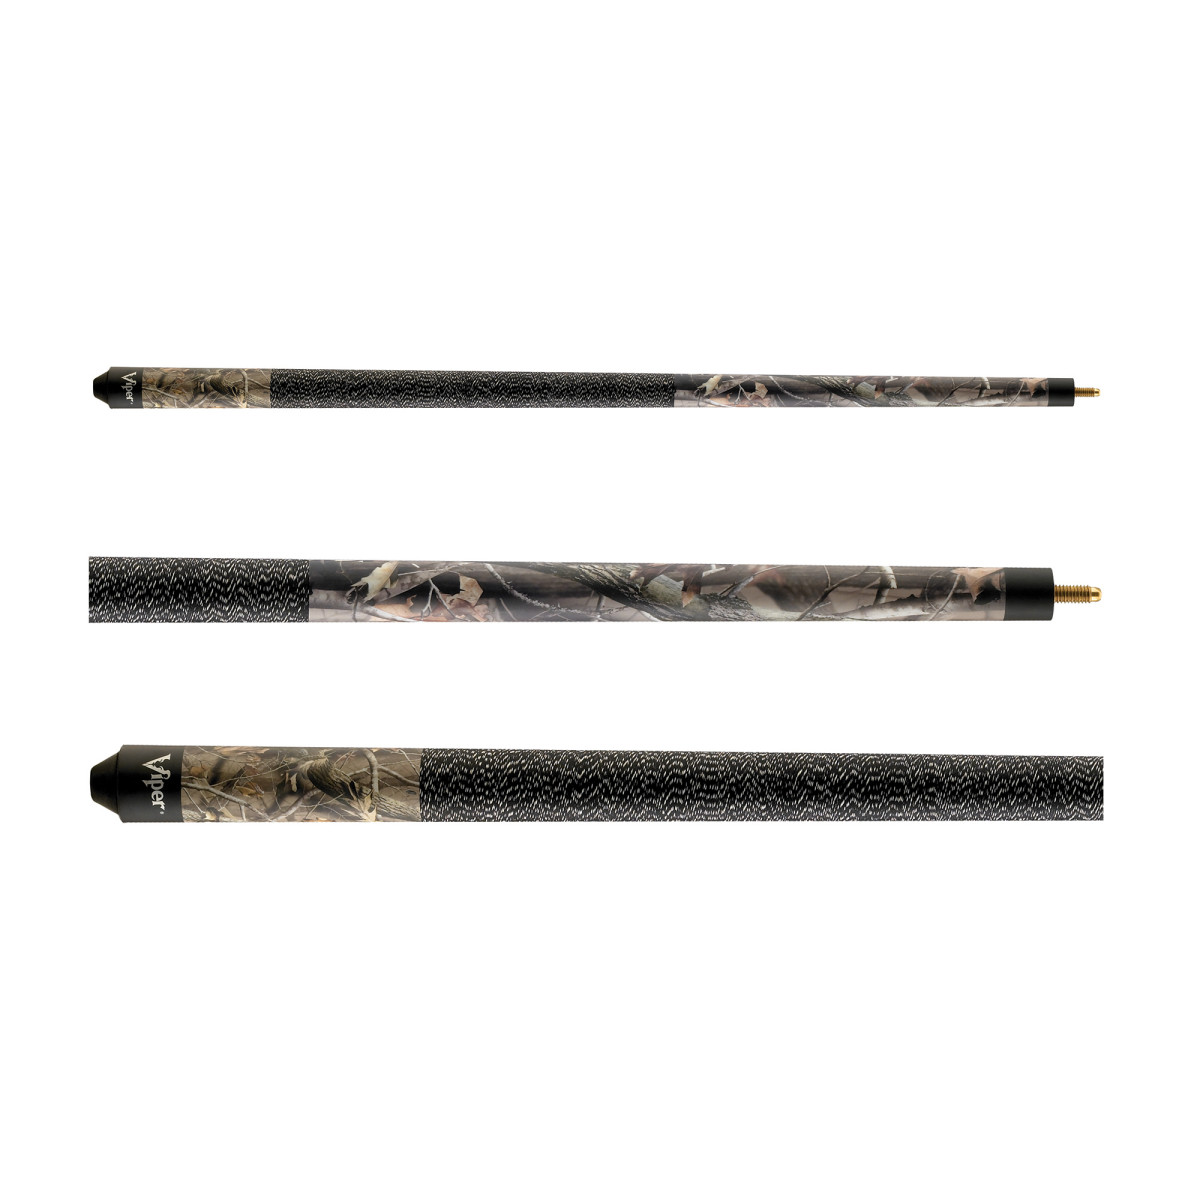 Viper Realtree Hardwoods Camo Pool Billiards Cue Stick 20 Ounces